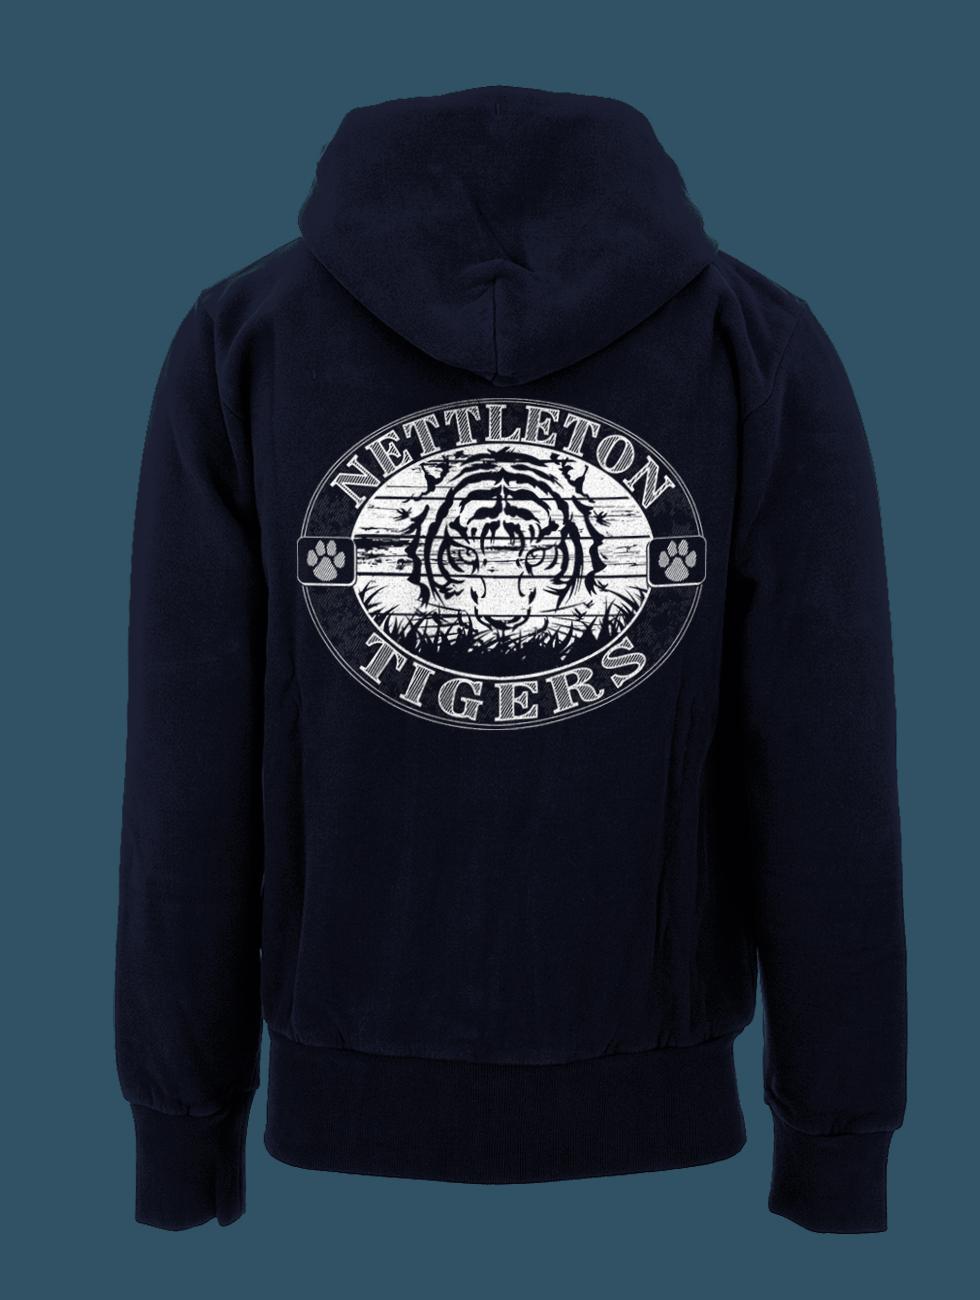 nettleton_navy hoodie.jpg